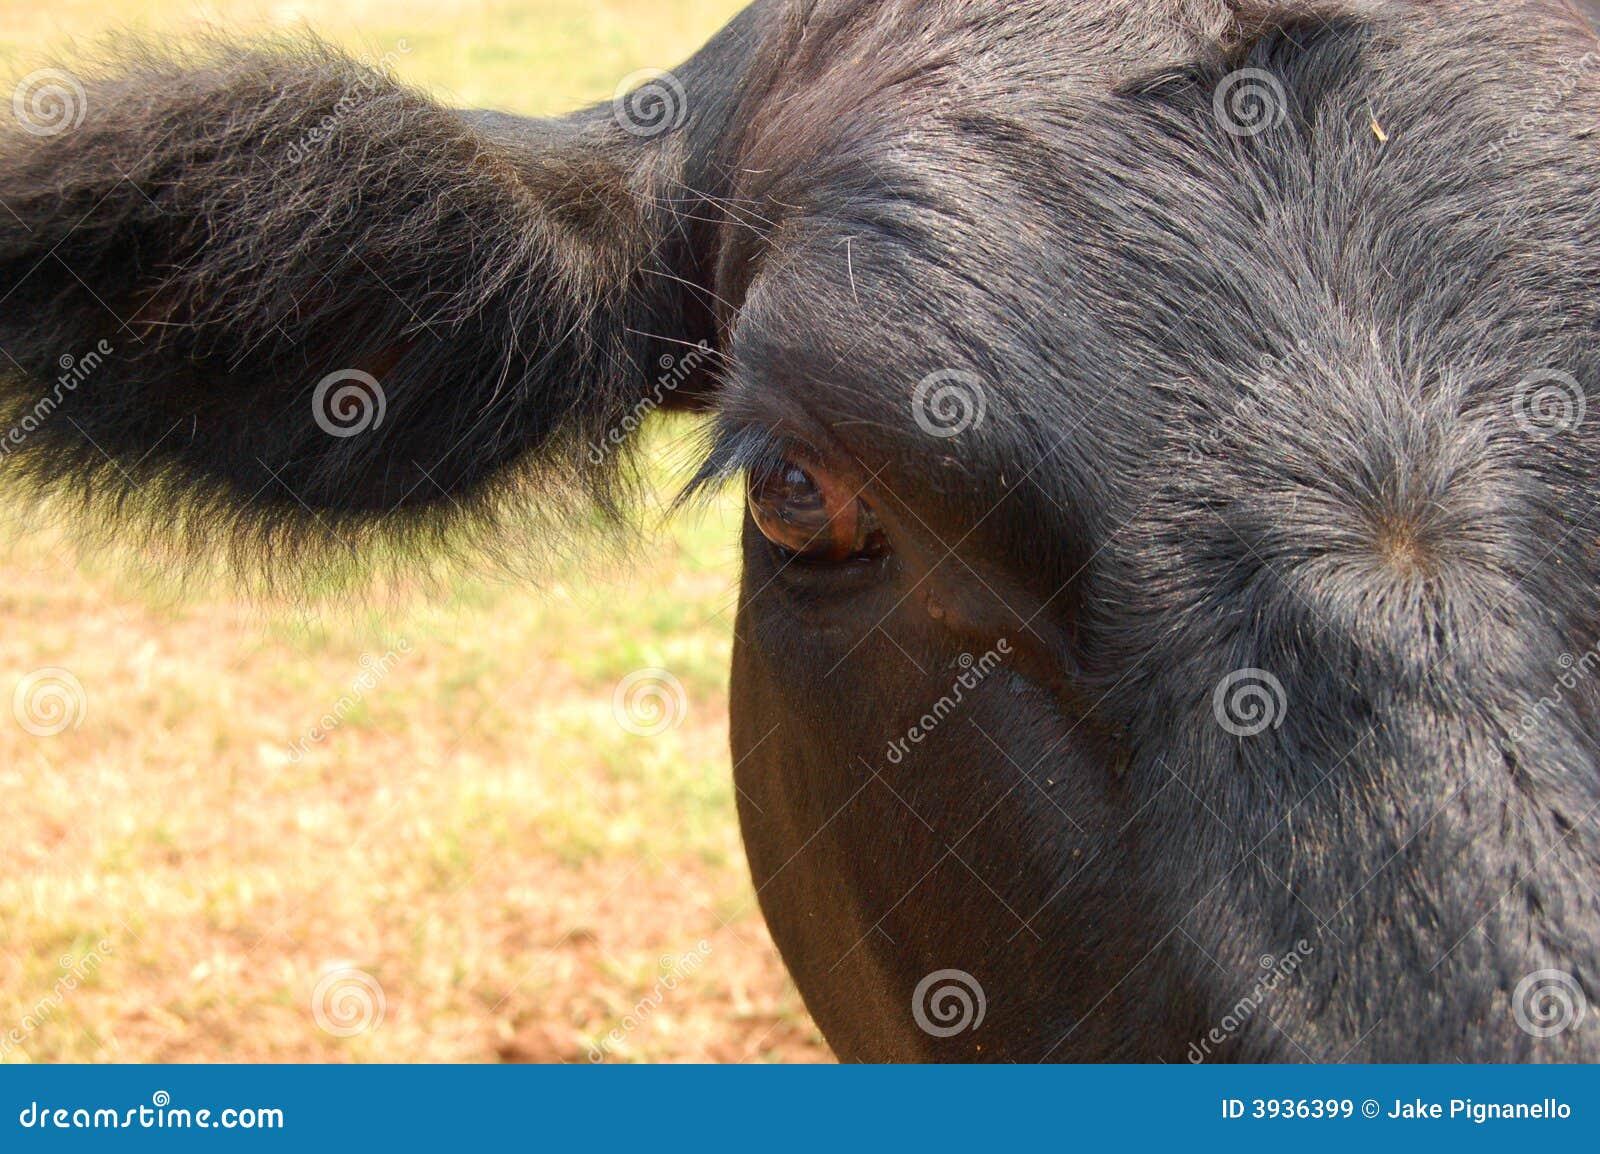 Black Cow ear and eye